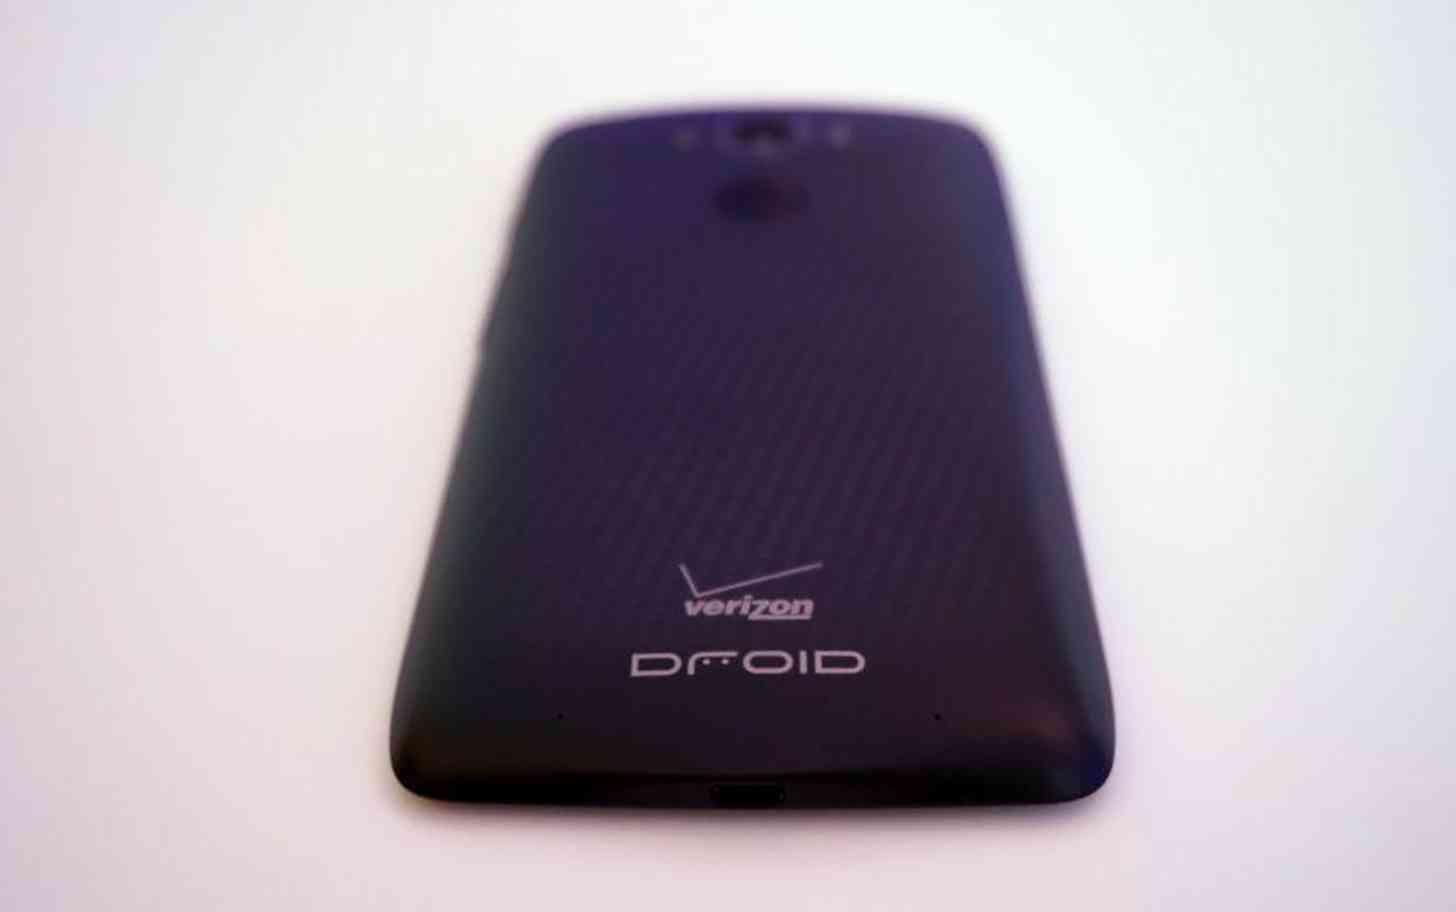 Motorola DROID Turbo rear